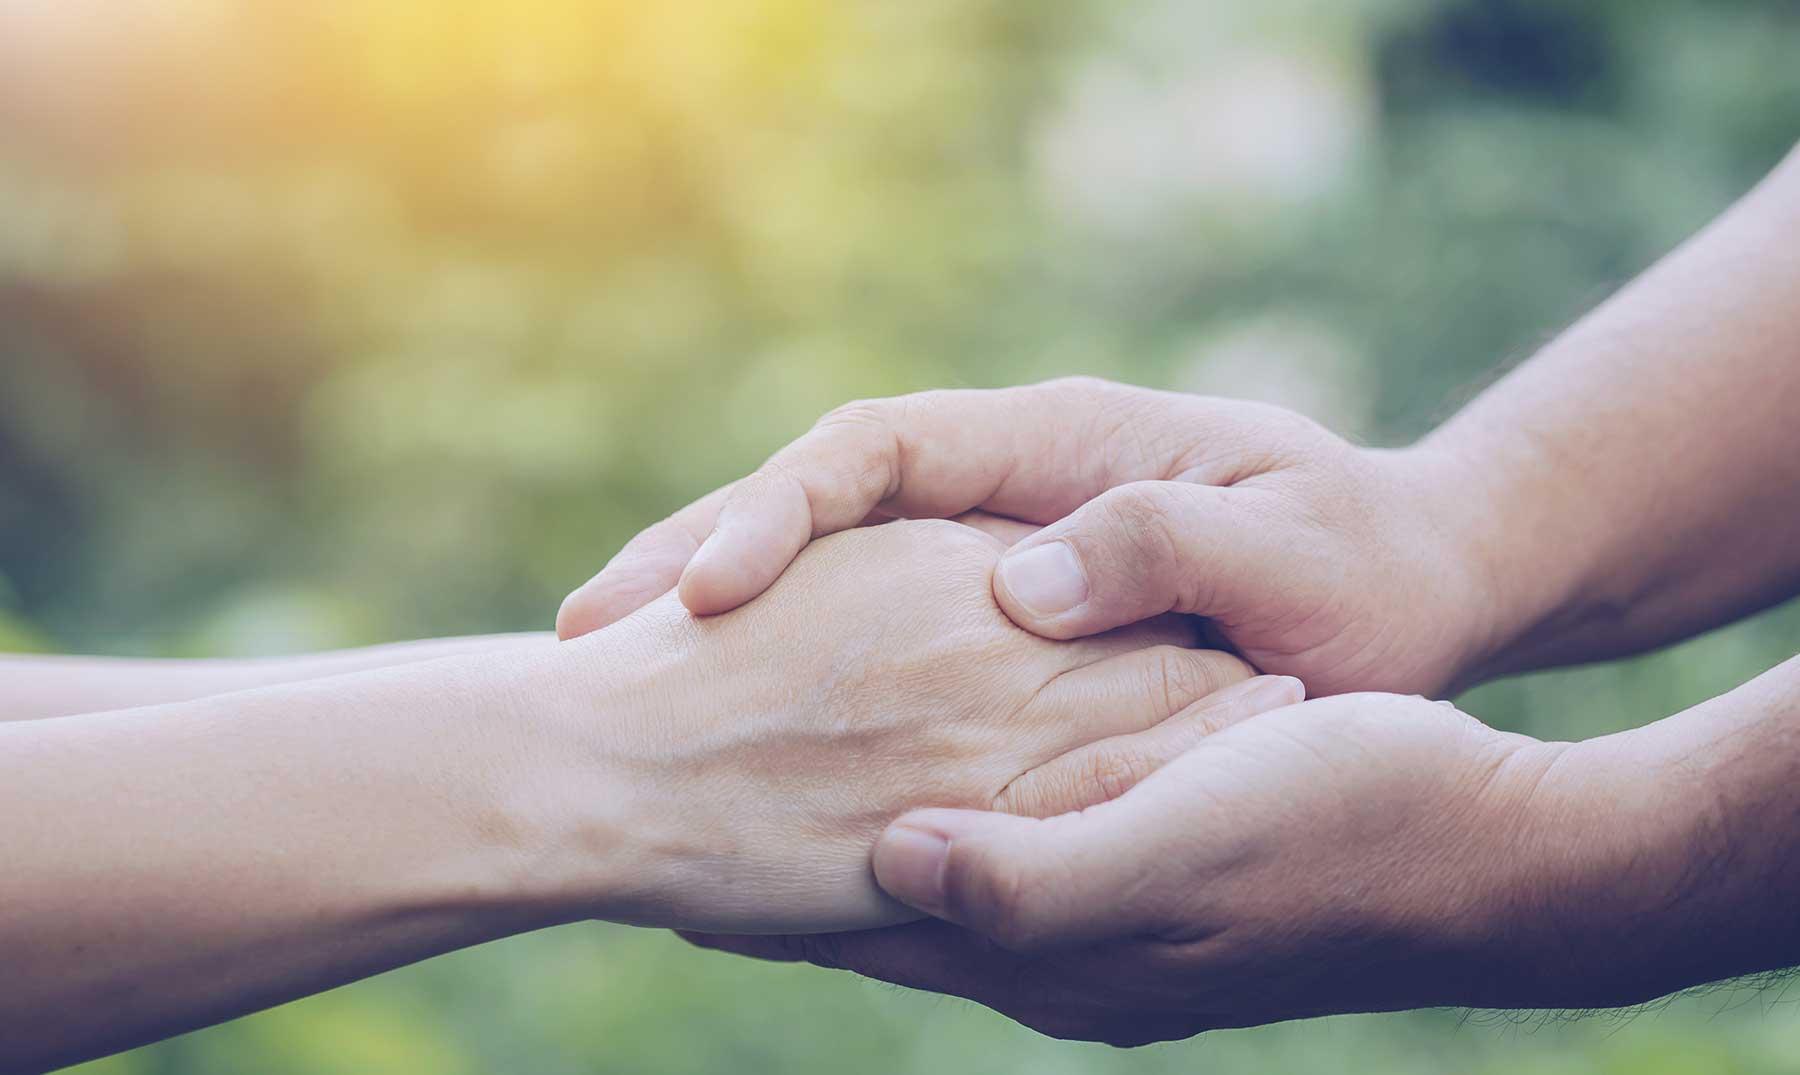 130 Frases De Consuelo Para Cuando Estás Mal Empieza A